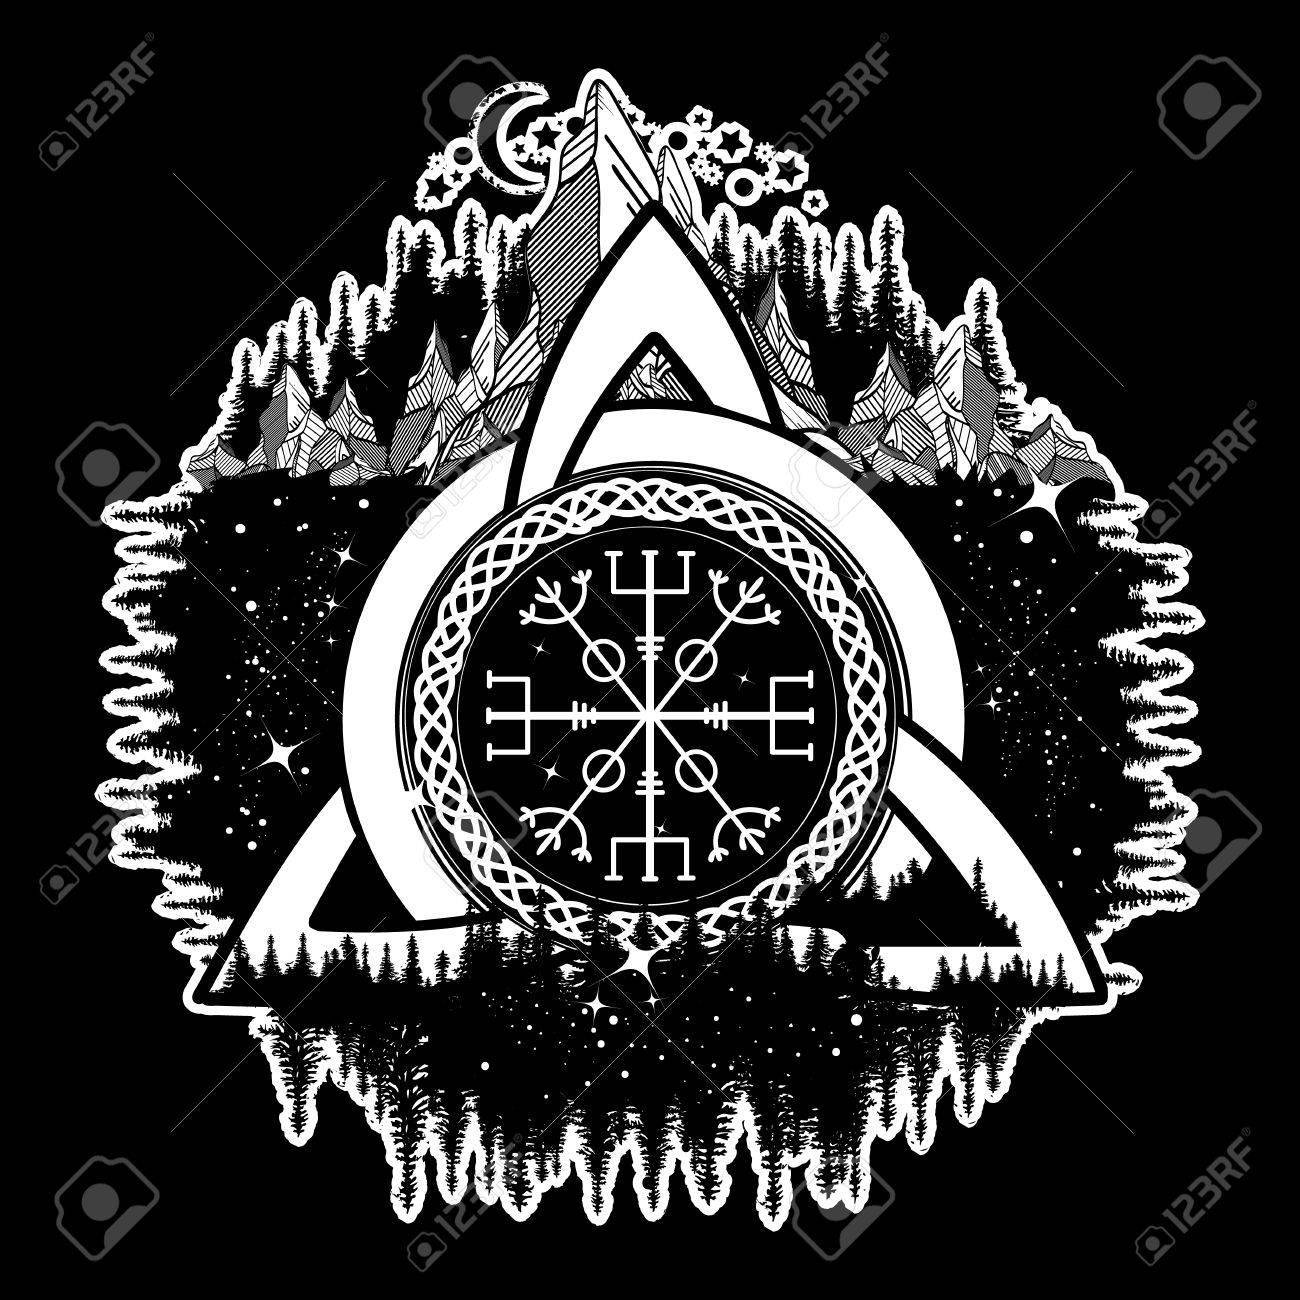 Viking nordic tattoo designs images for tatouage viking nordic tattoo designs with celtic trinity knot helm of awe aegishjalmur tattoo biocorpaavc Gallery